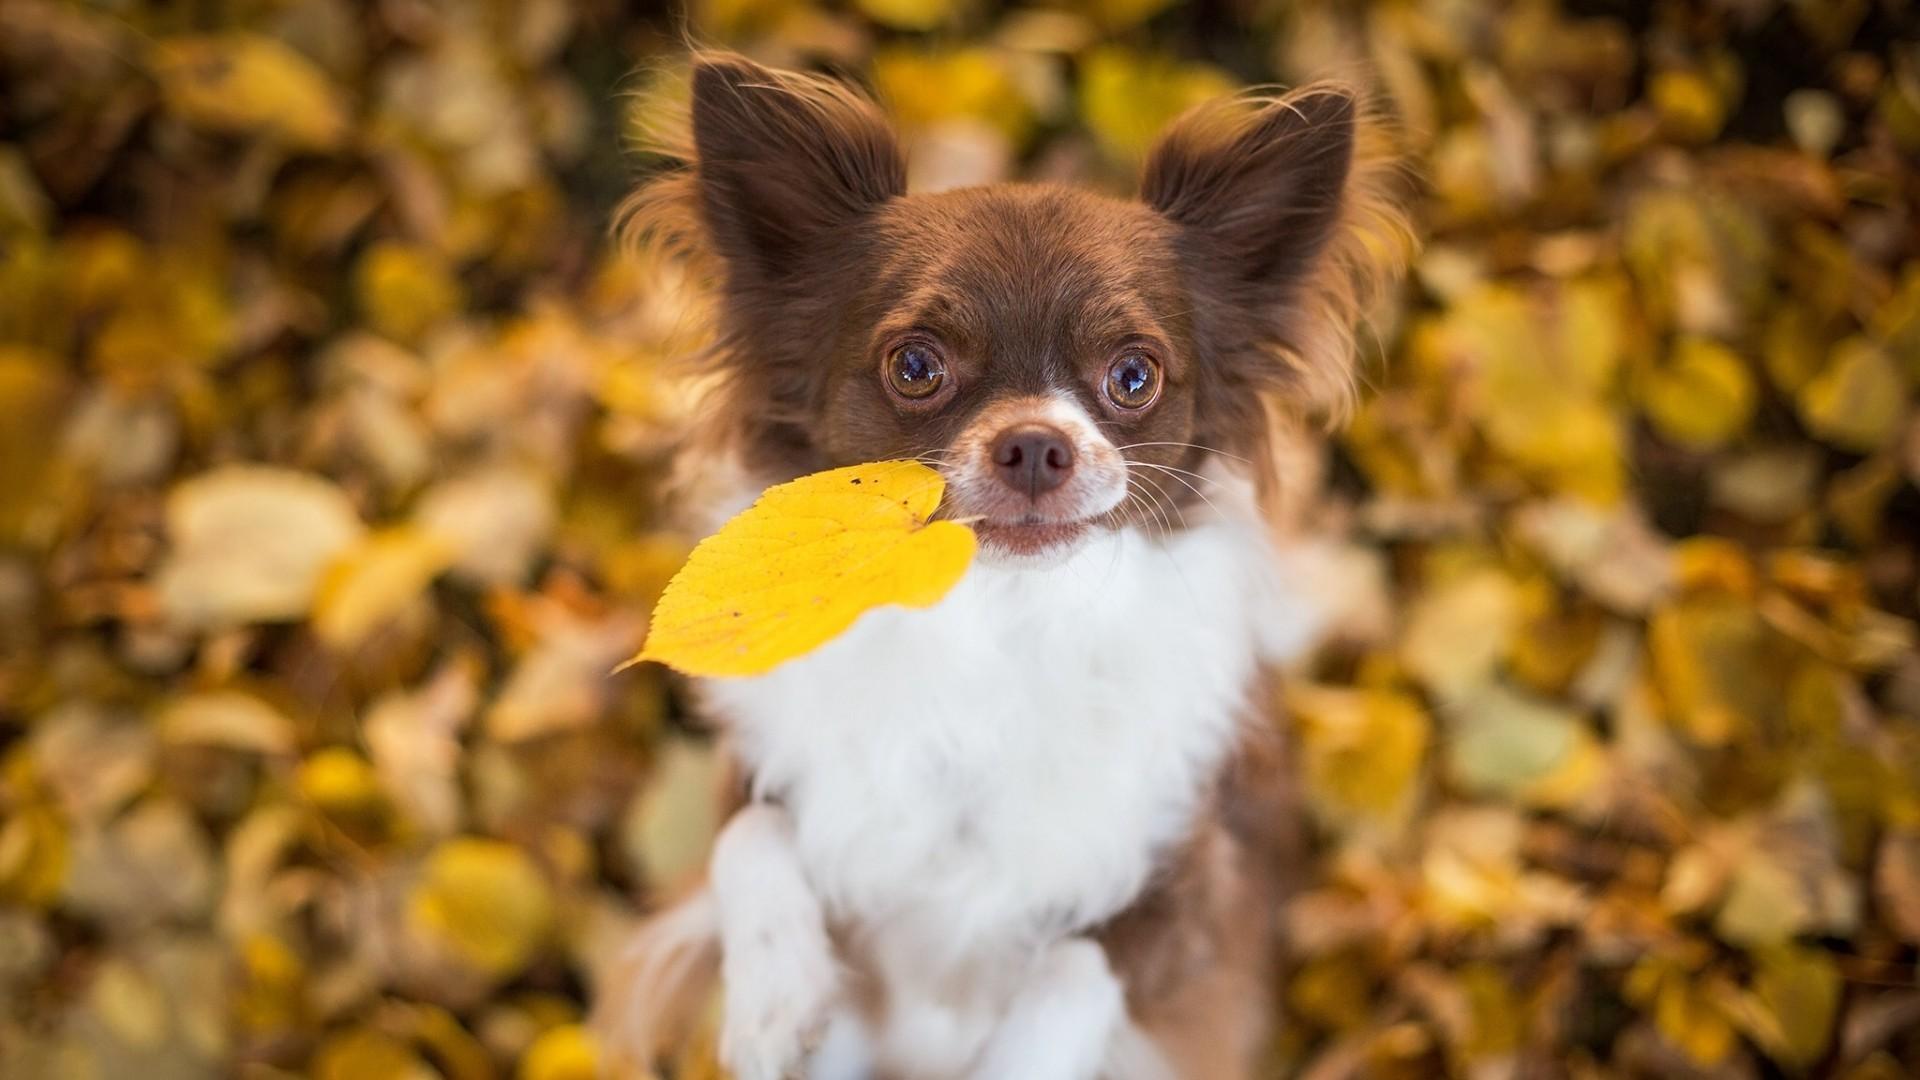 Wallpaper chihuahua, dog, foliage, autumn